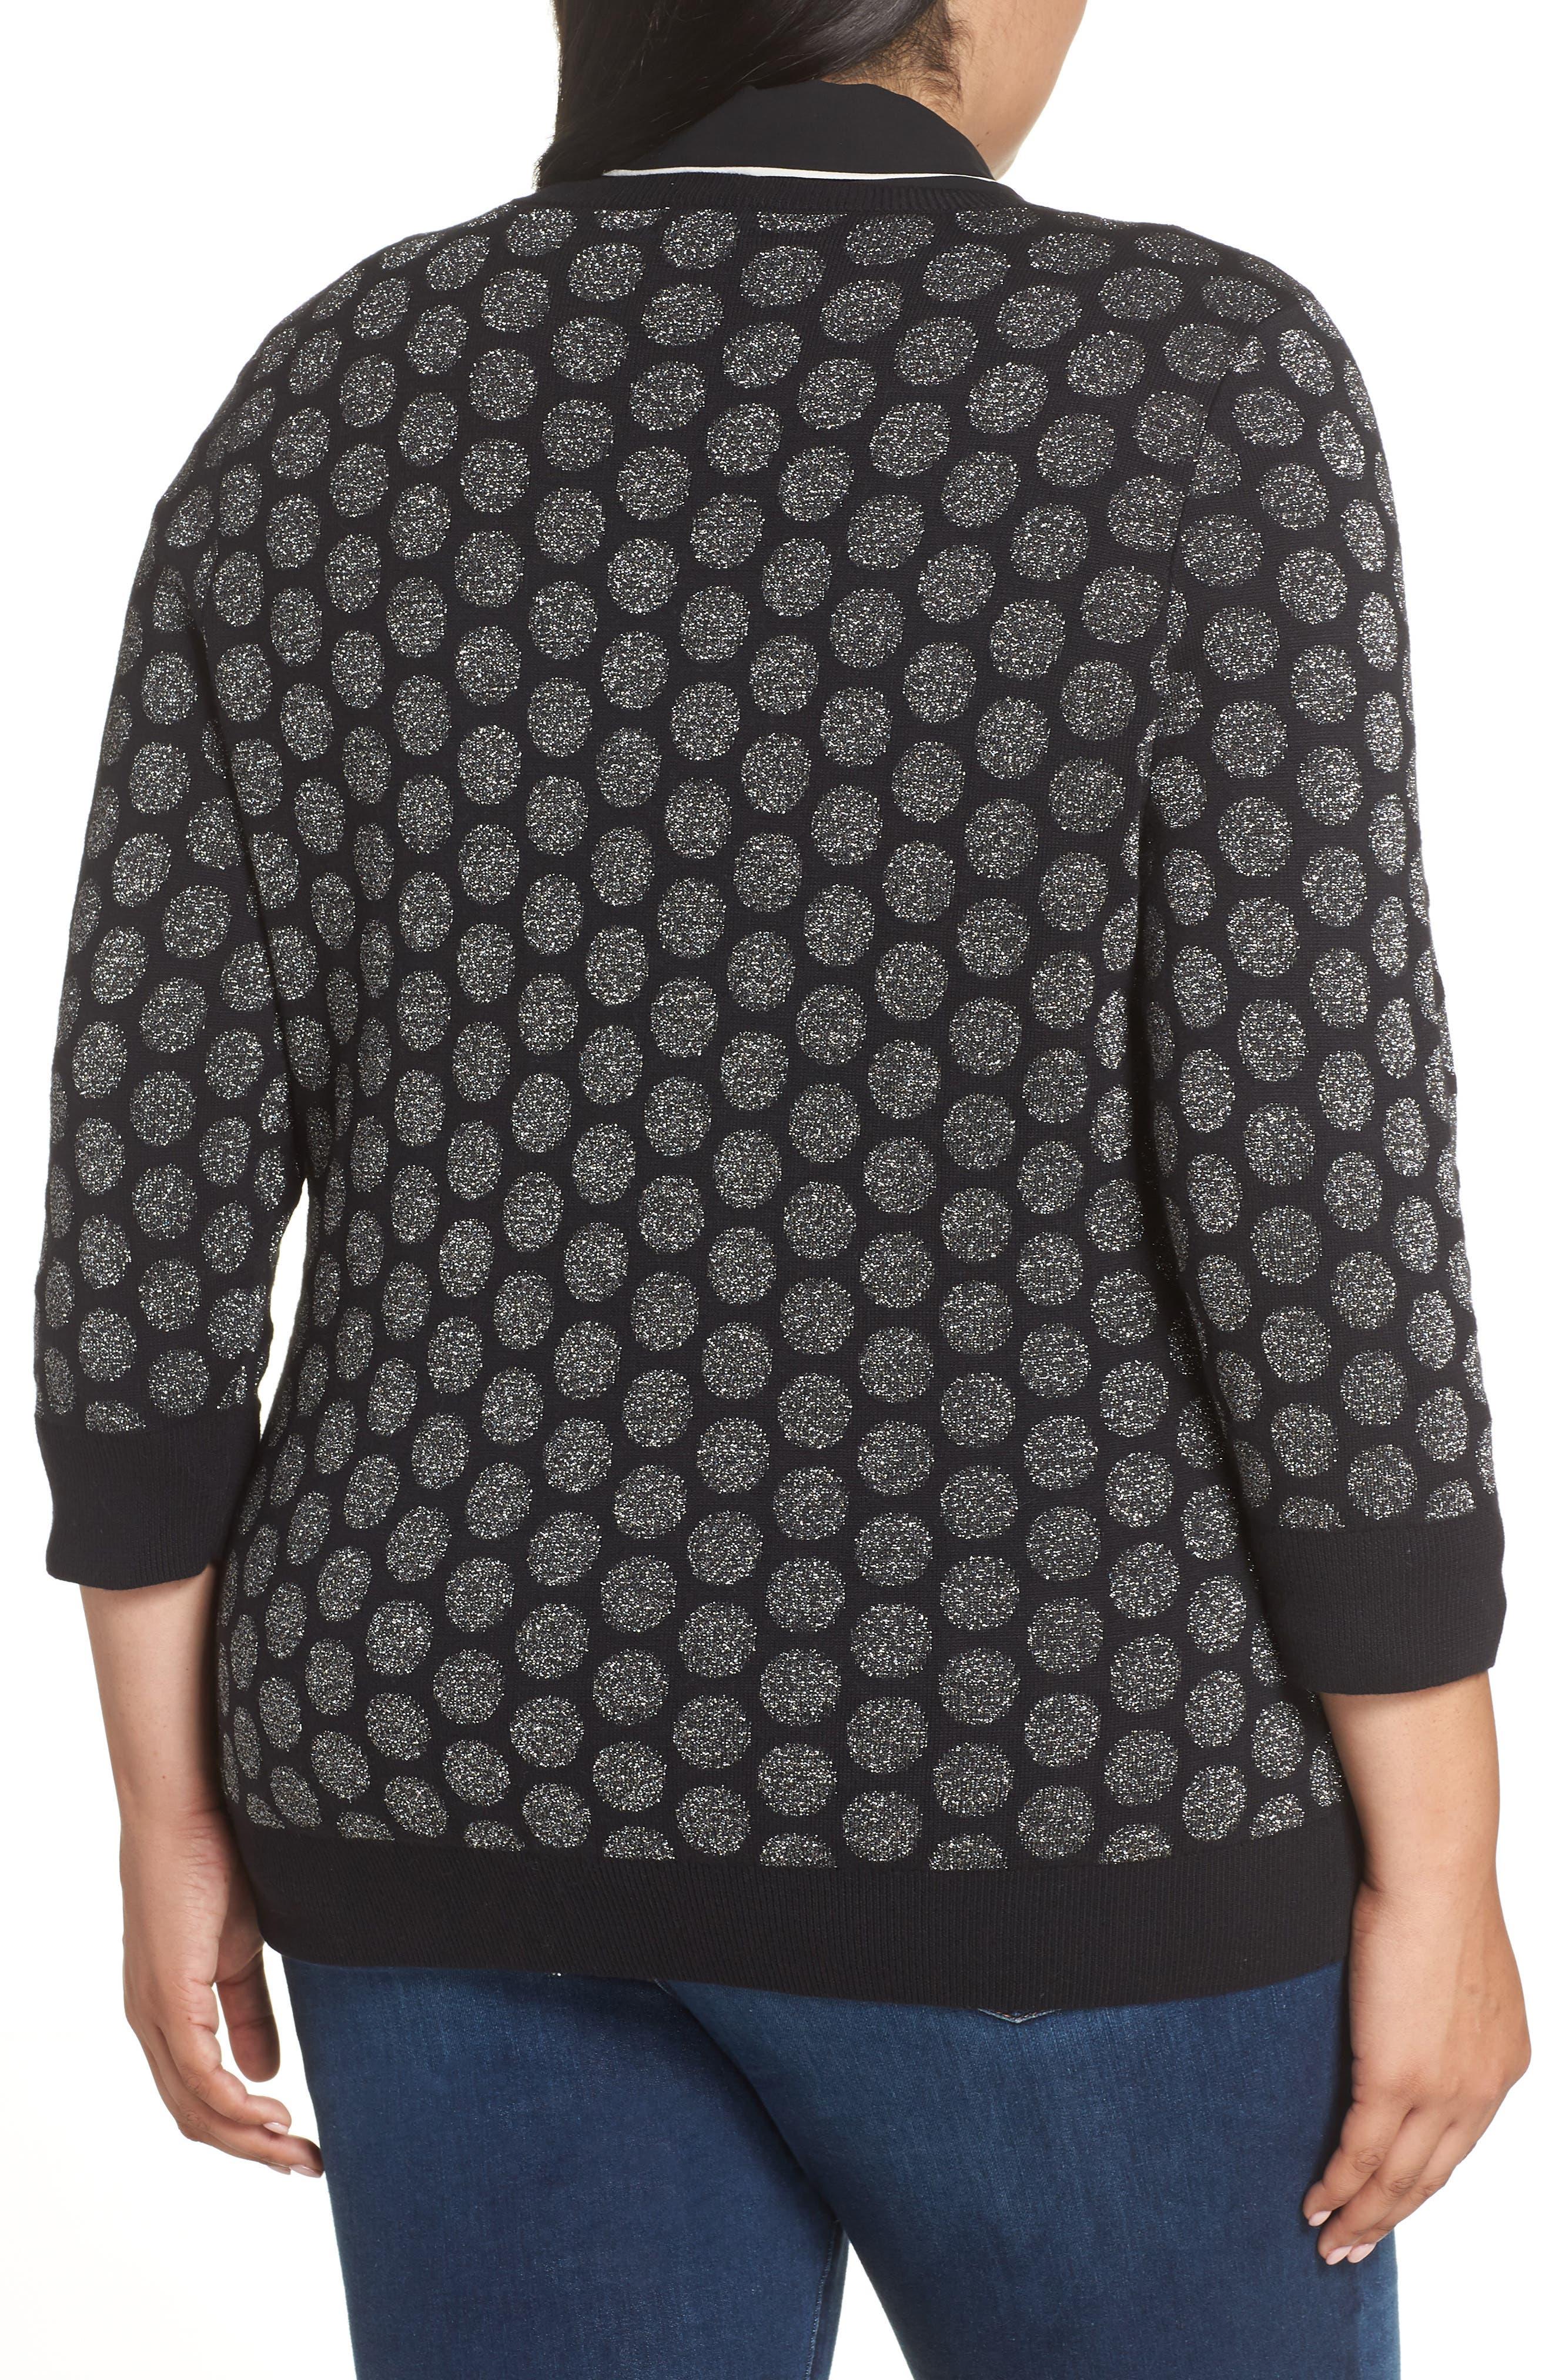 x Atlantic-Pacific Shimmer Dot Sweater,                             Alternate thumbnail 2, color,                             BLACK